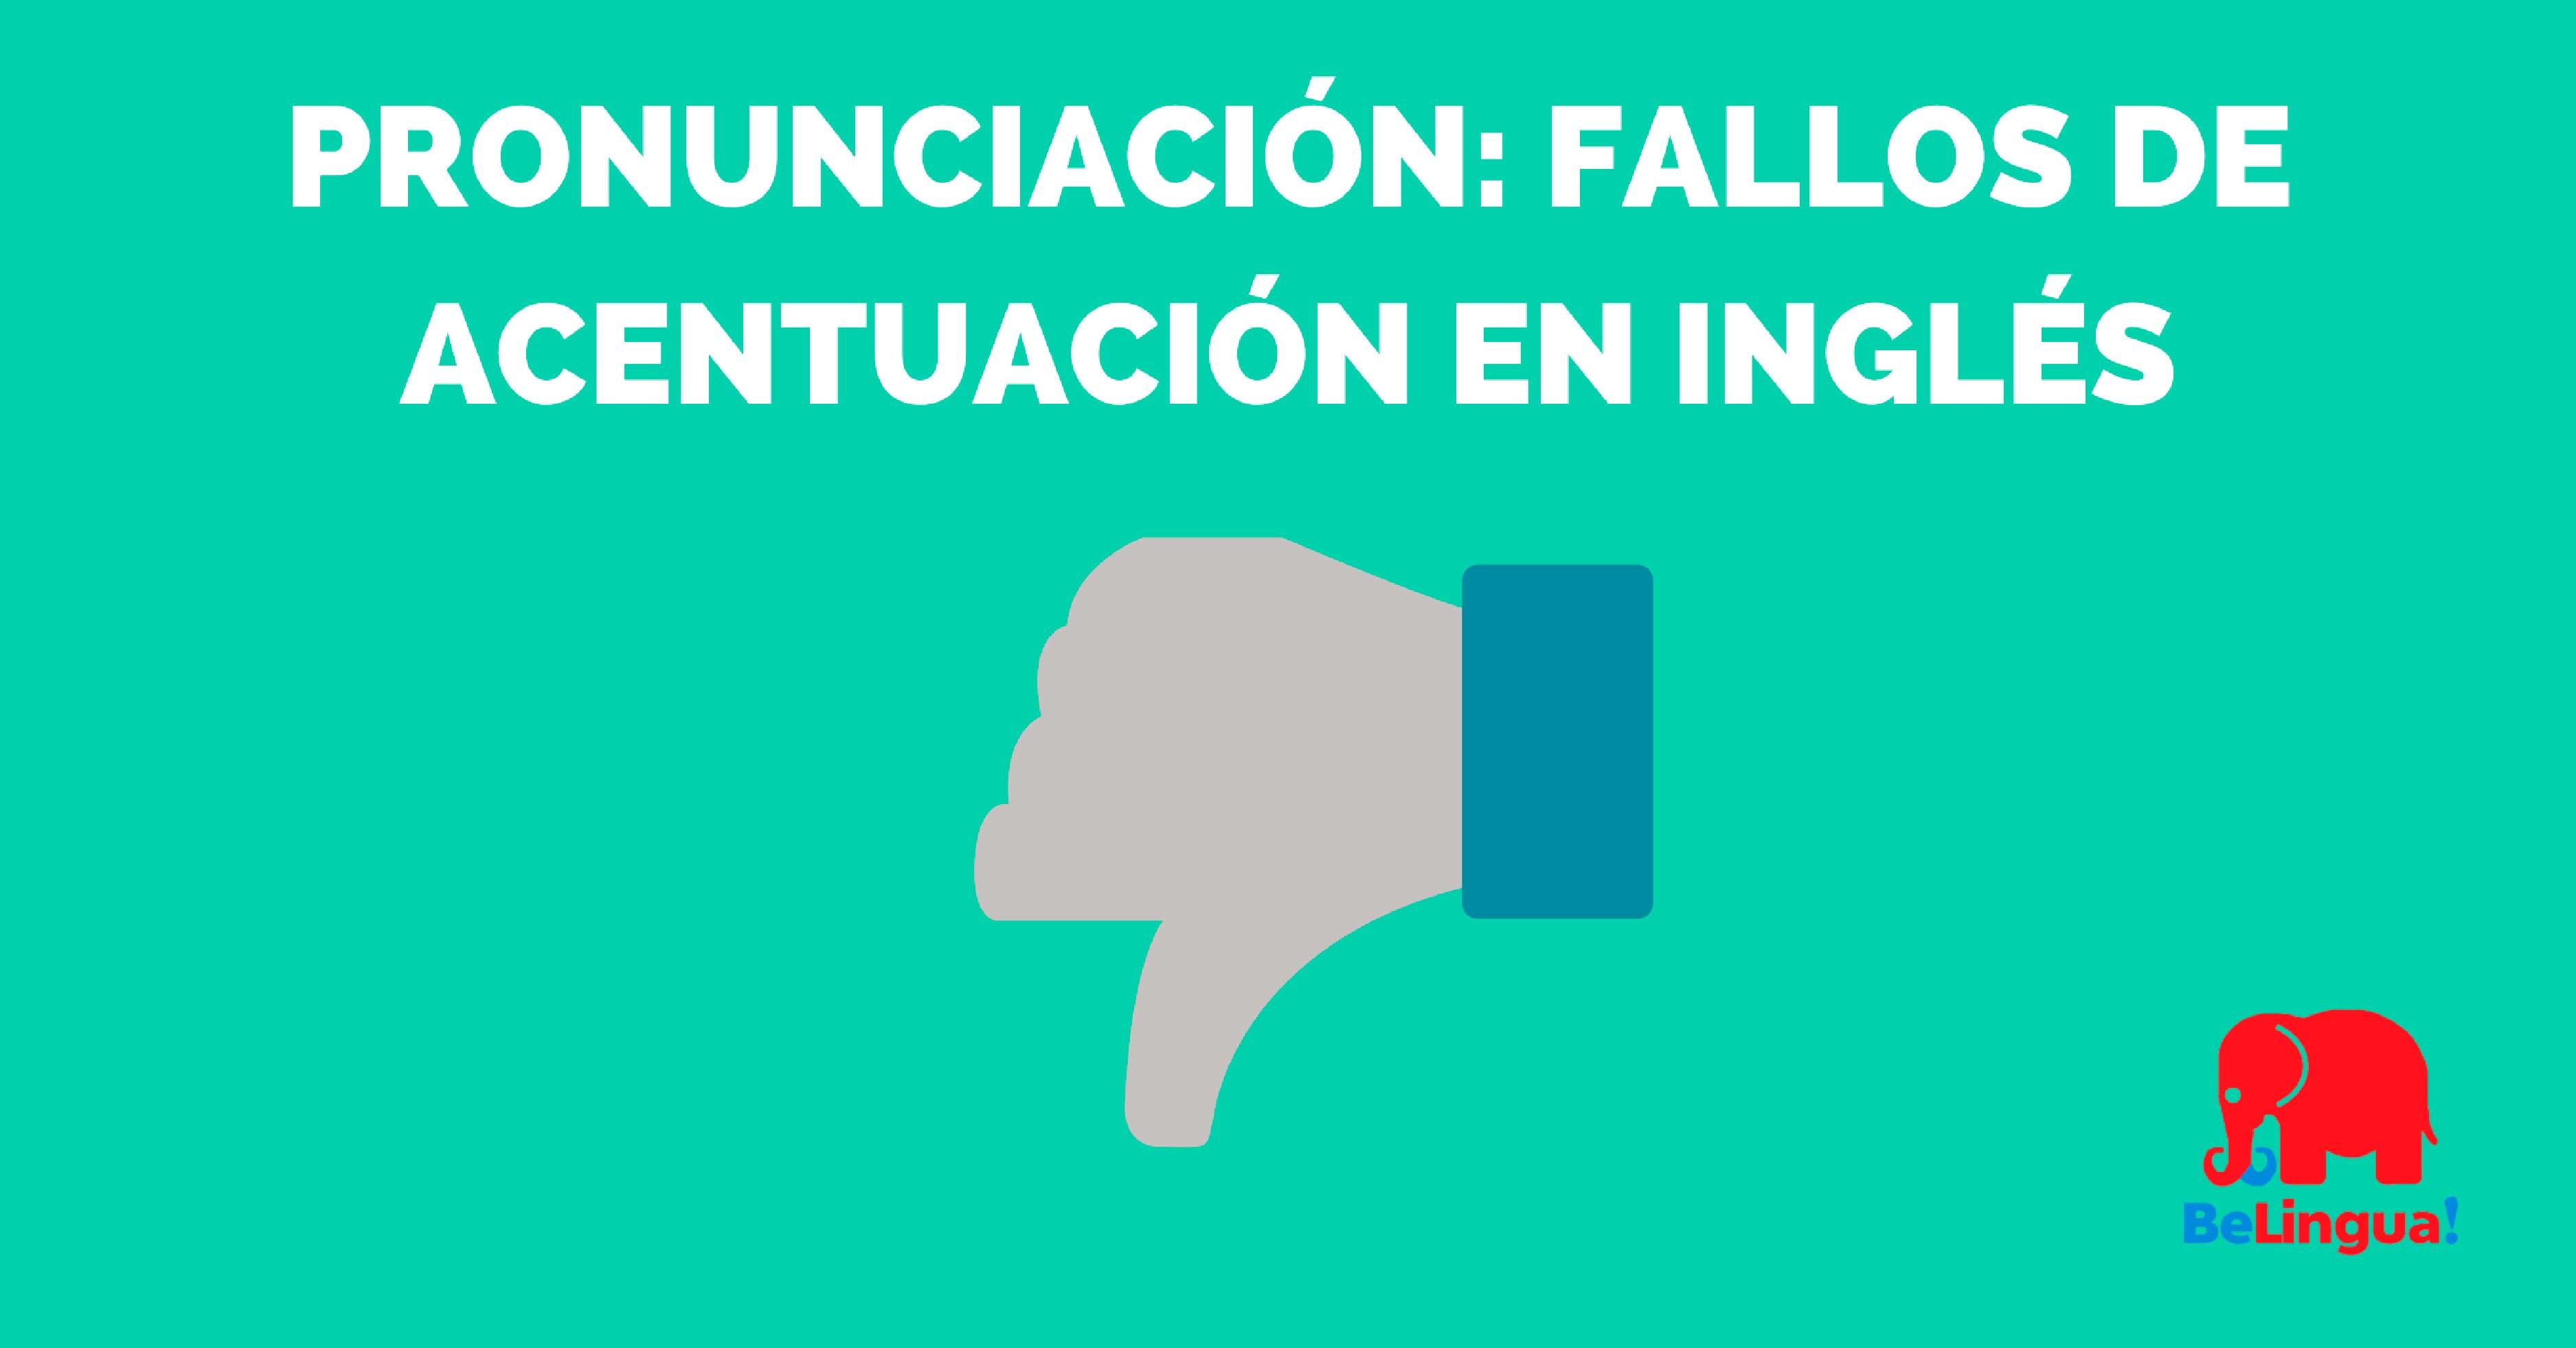 Pronunciación: fallos de acentuación en inglés